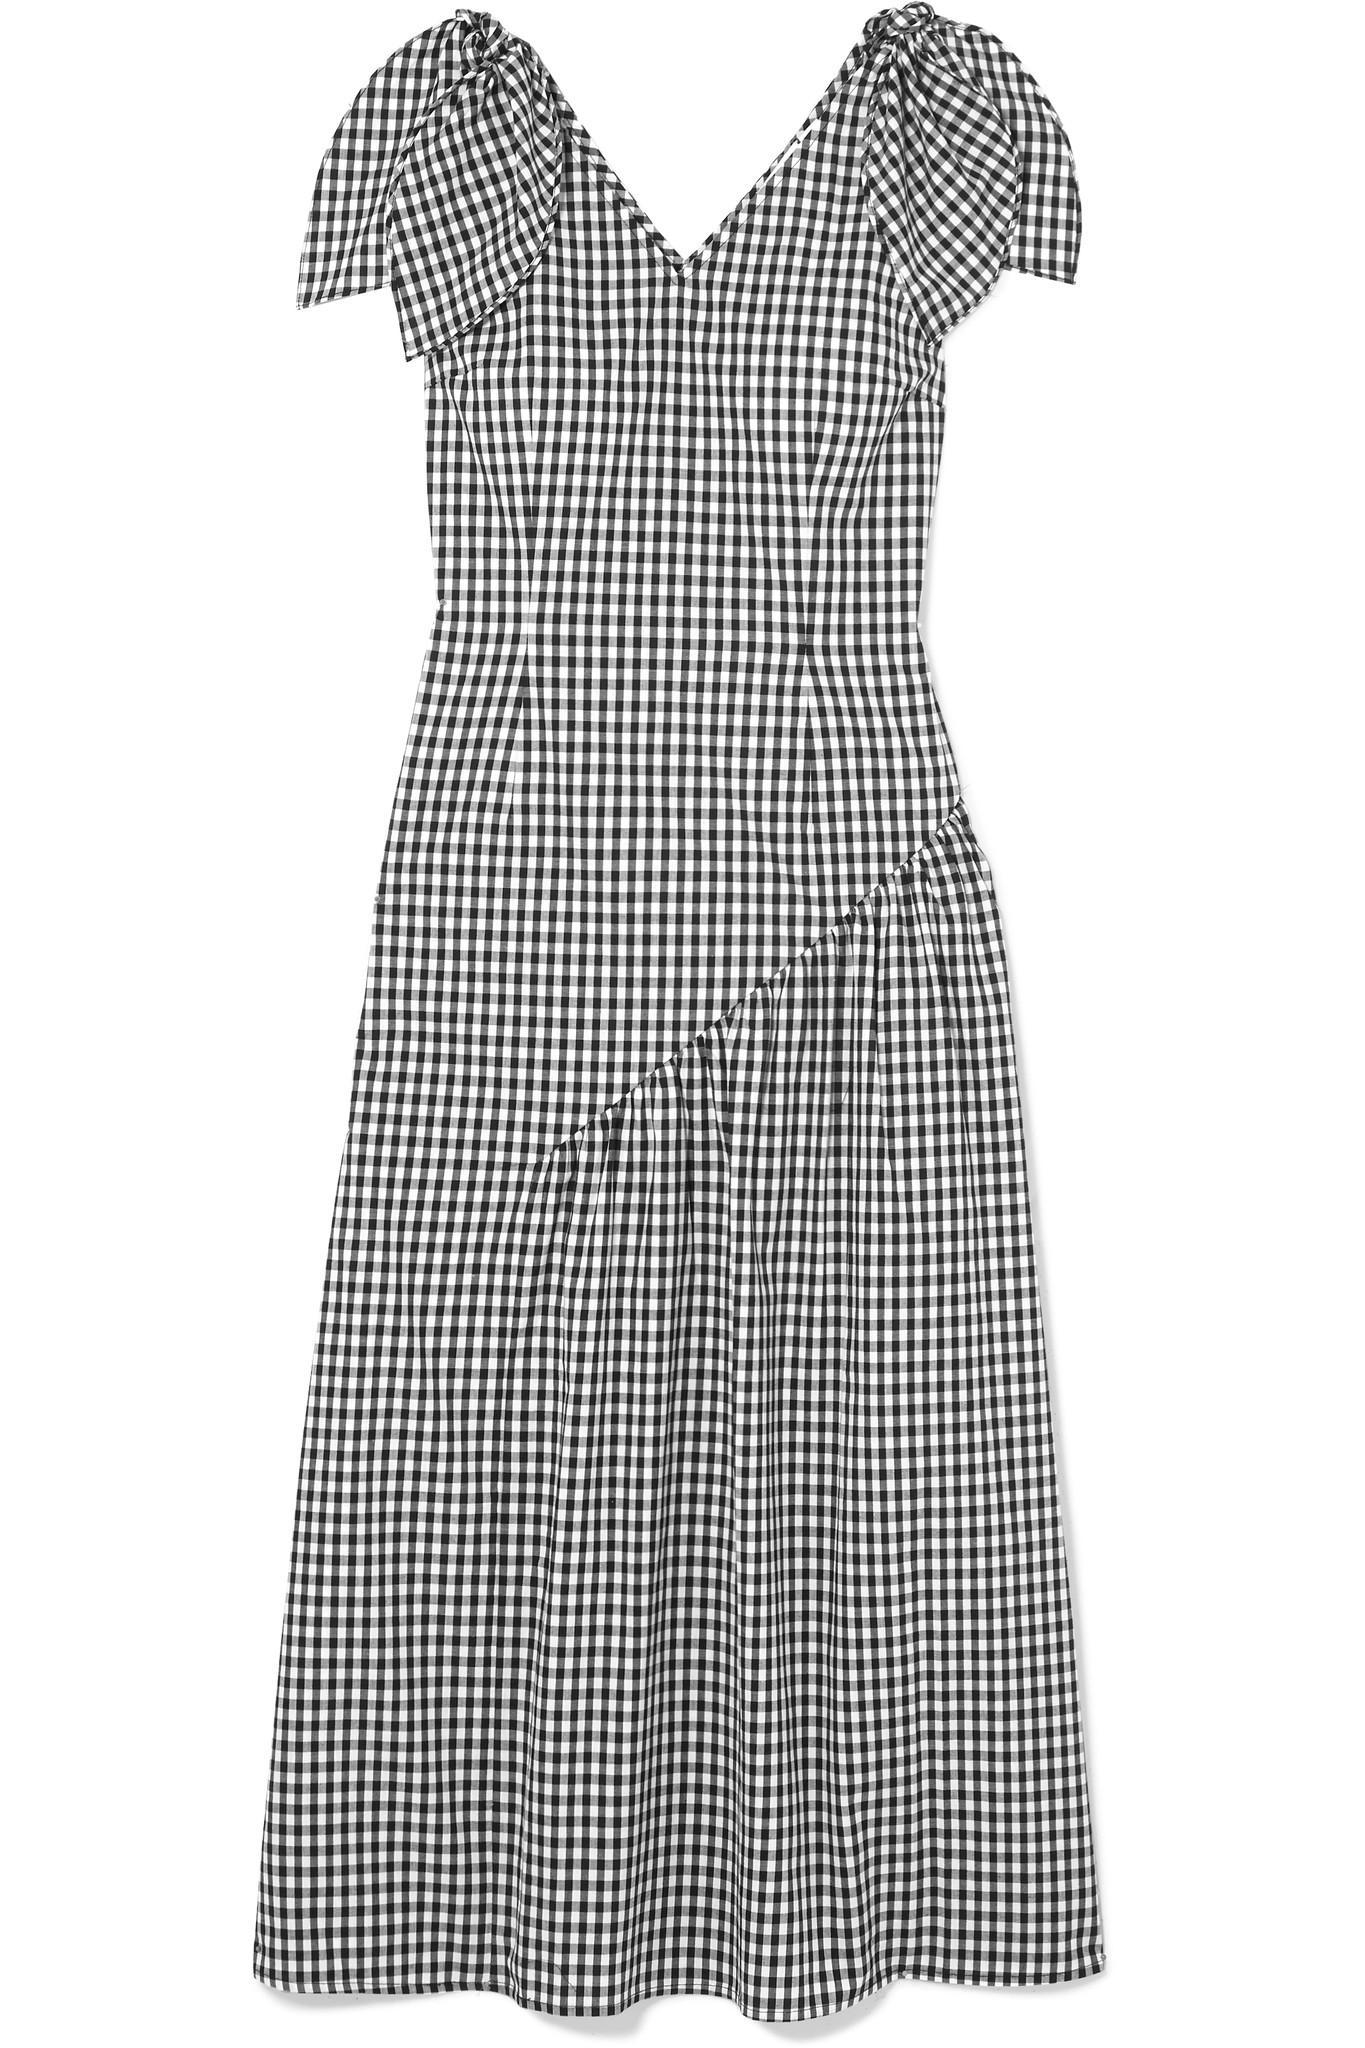 Lily Bow-embellished Gingham Cotton Midi Dress - Black Rejina Pyo xkR6r